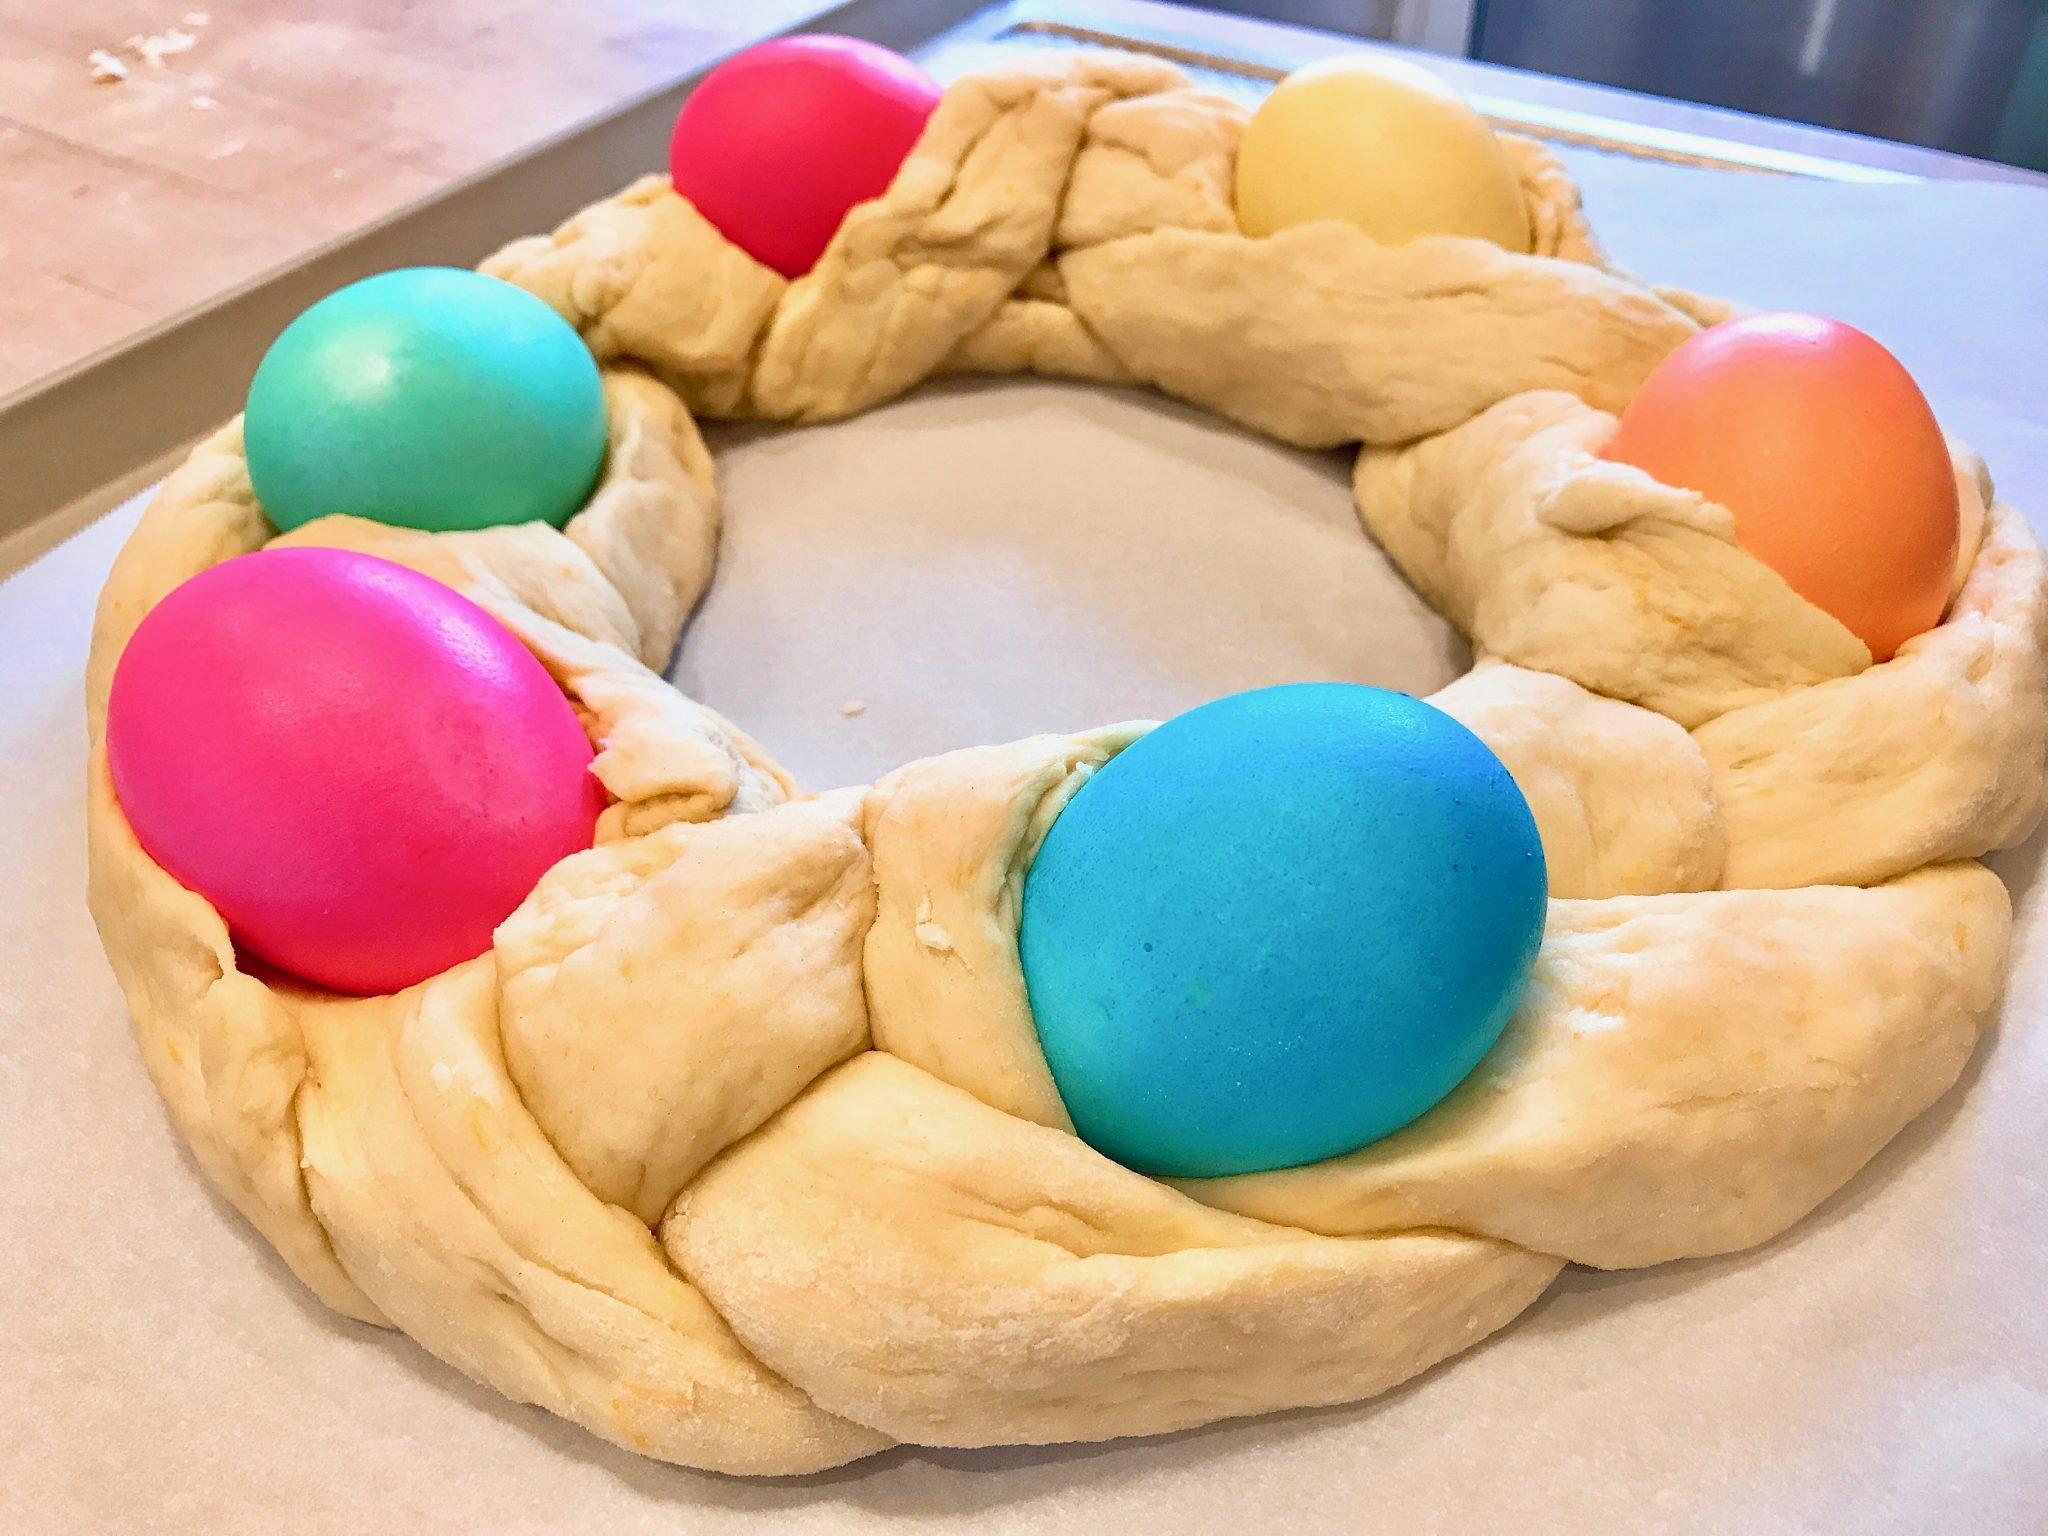 Italian Easter Bread unbaked